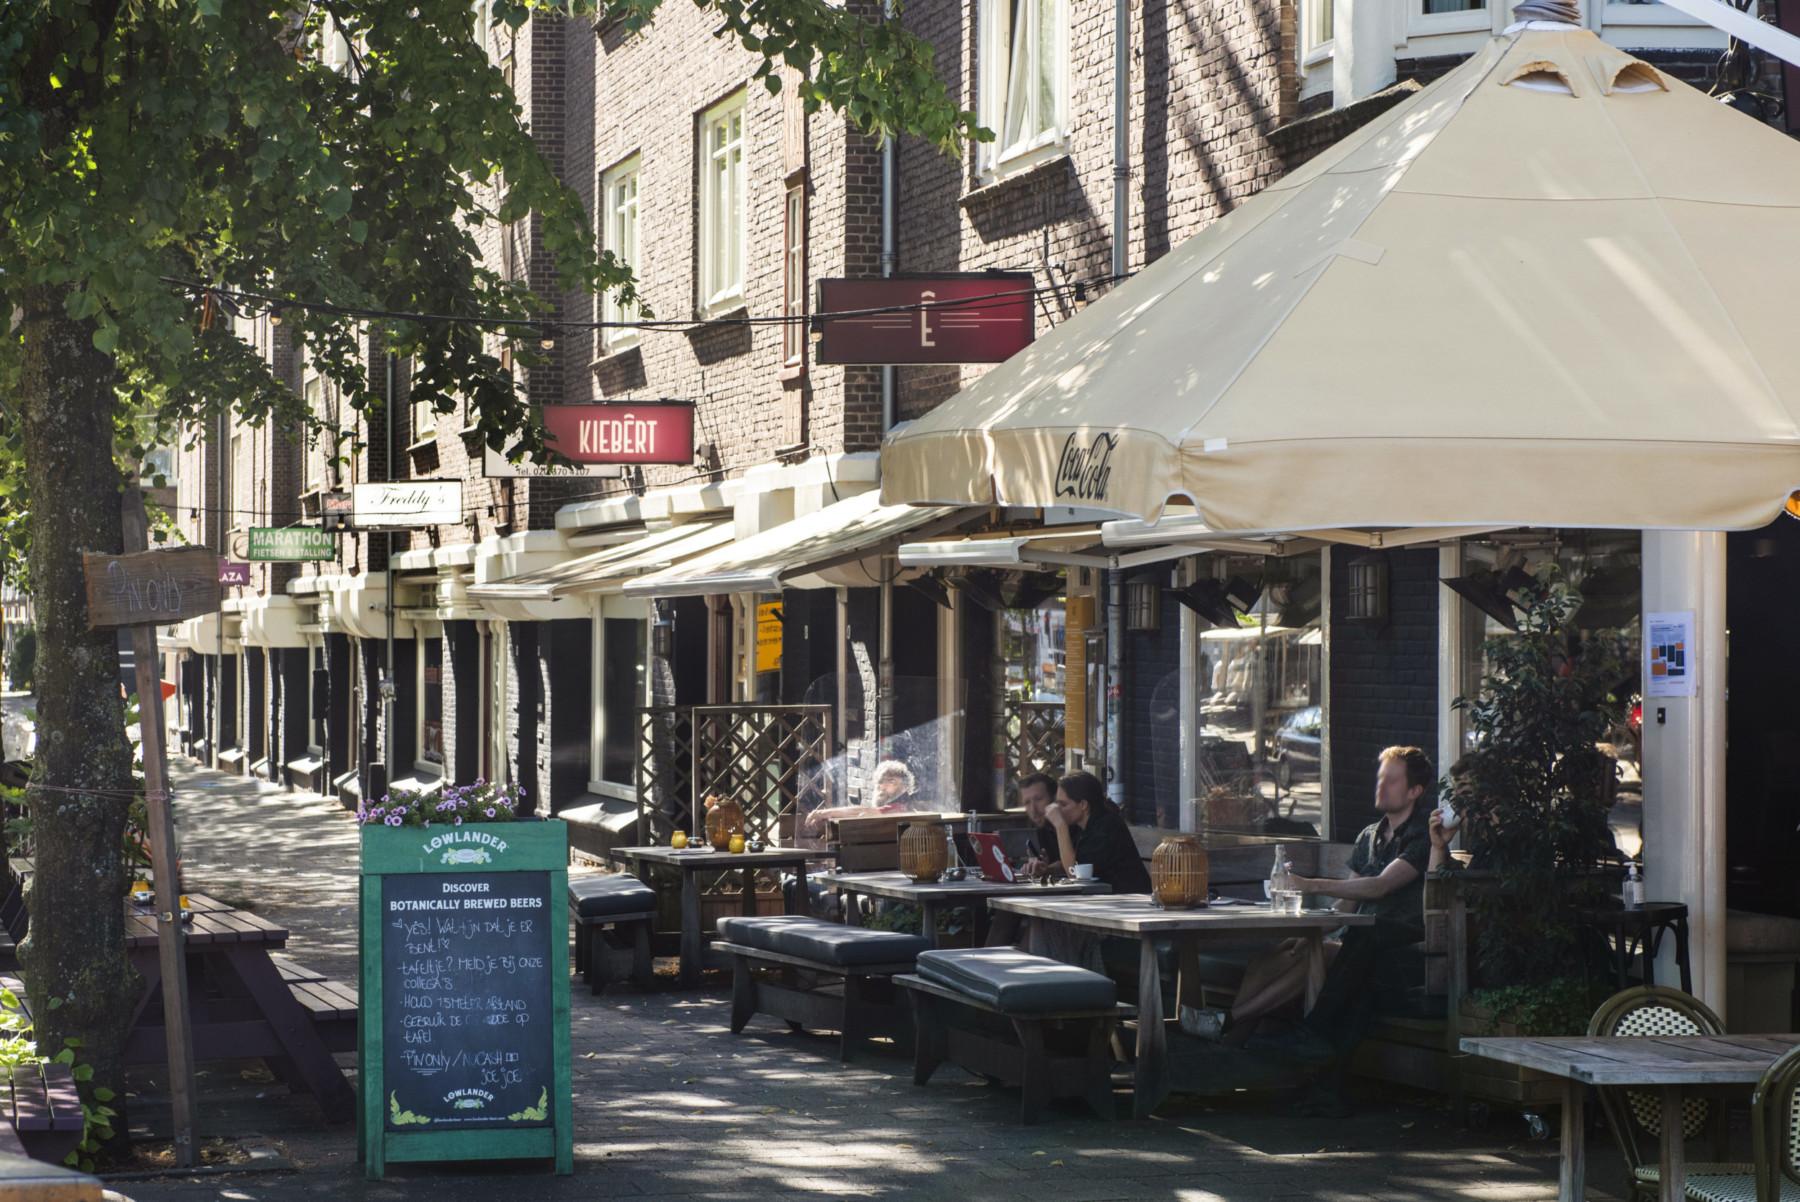 Marathonweg amsterdam on schlouk map with all info: Marathonweg 15, Amsterdam - P van den Bosch Bedrijfsmakelaars